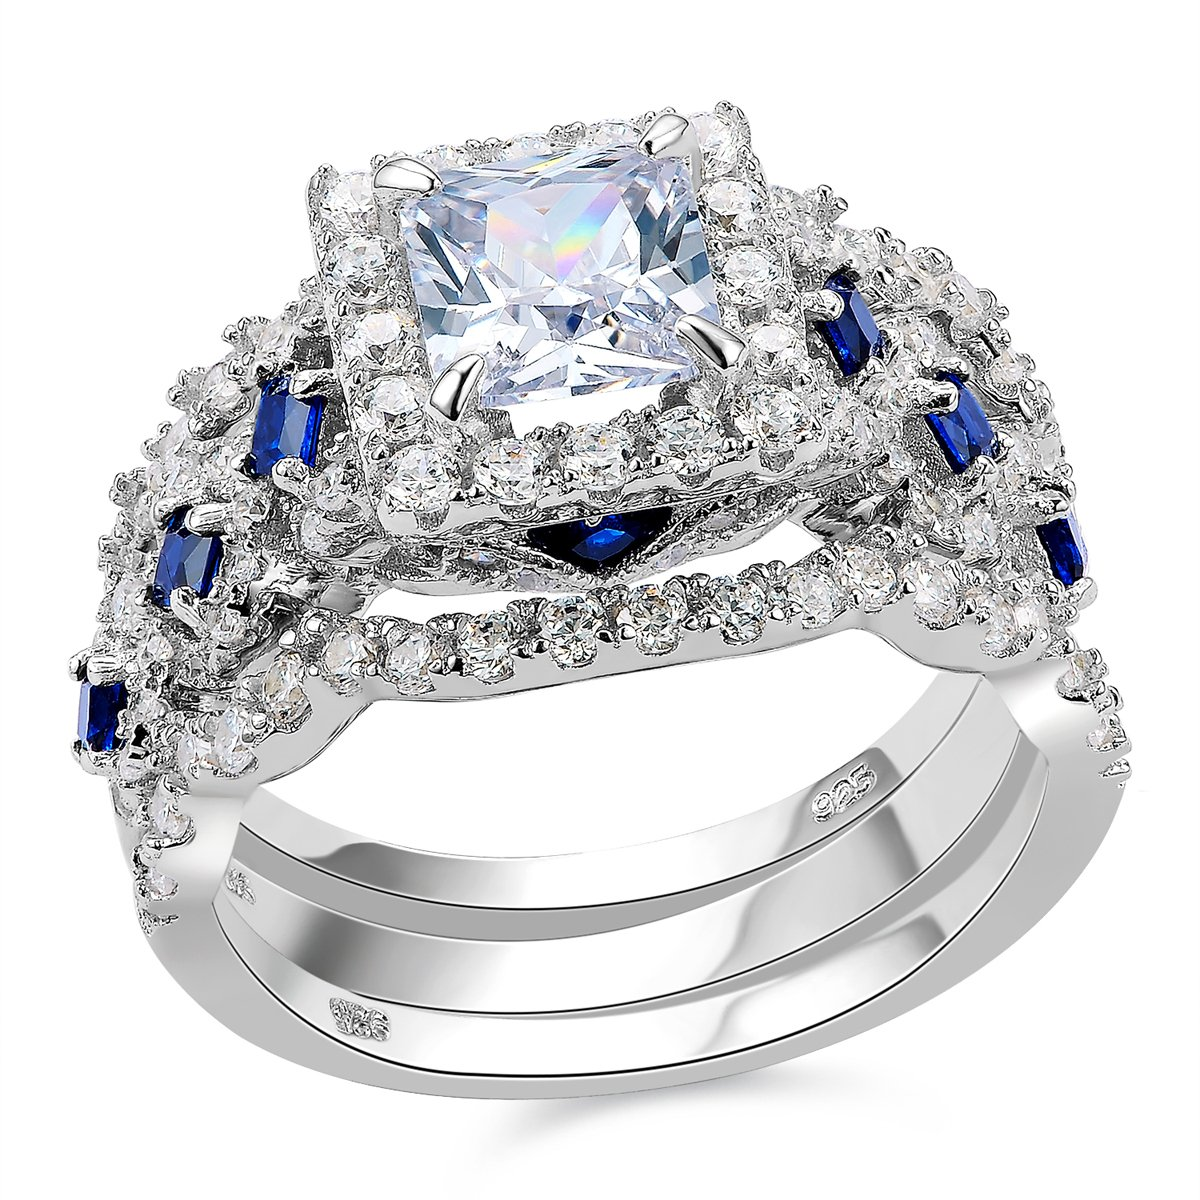 Newshe Engagement Wedding Ring Set 925 Sterling Silver 3pcs 2.5ct Princess White Cz Blue Size 8